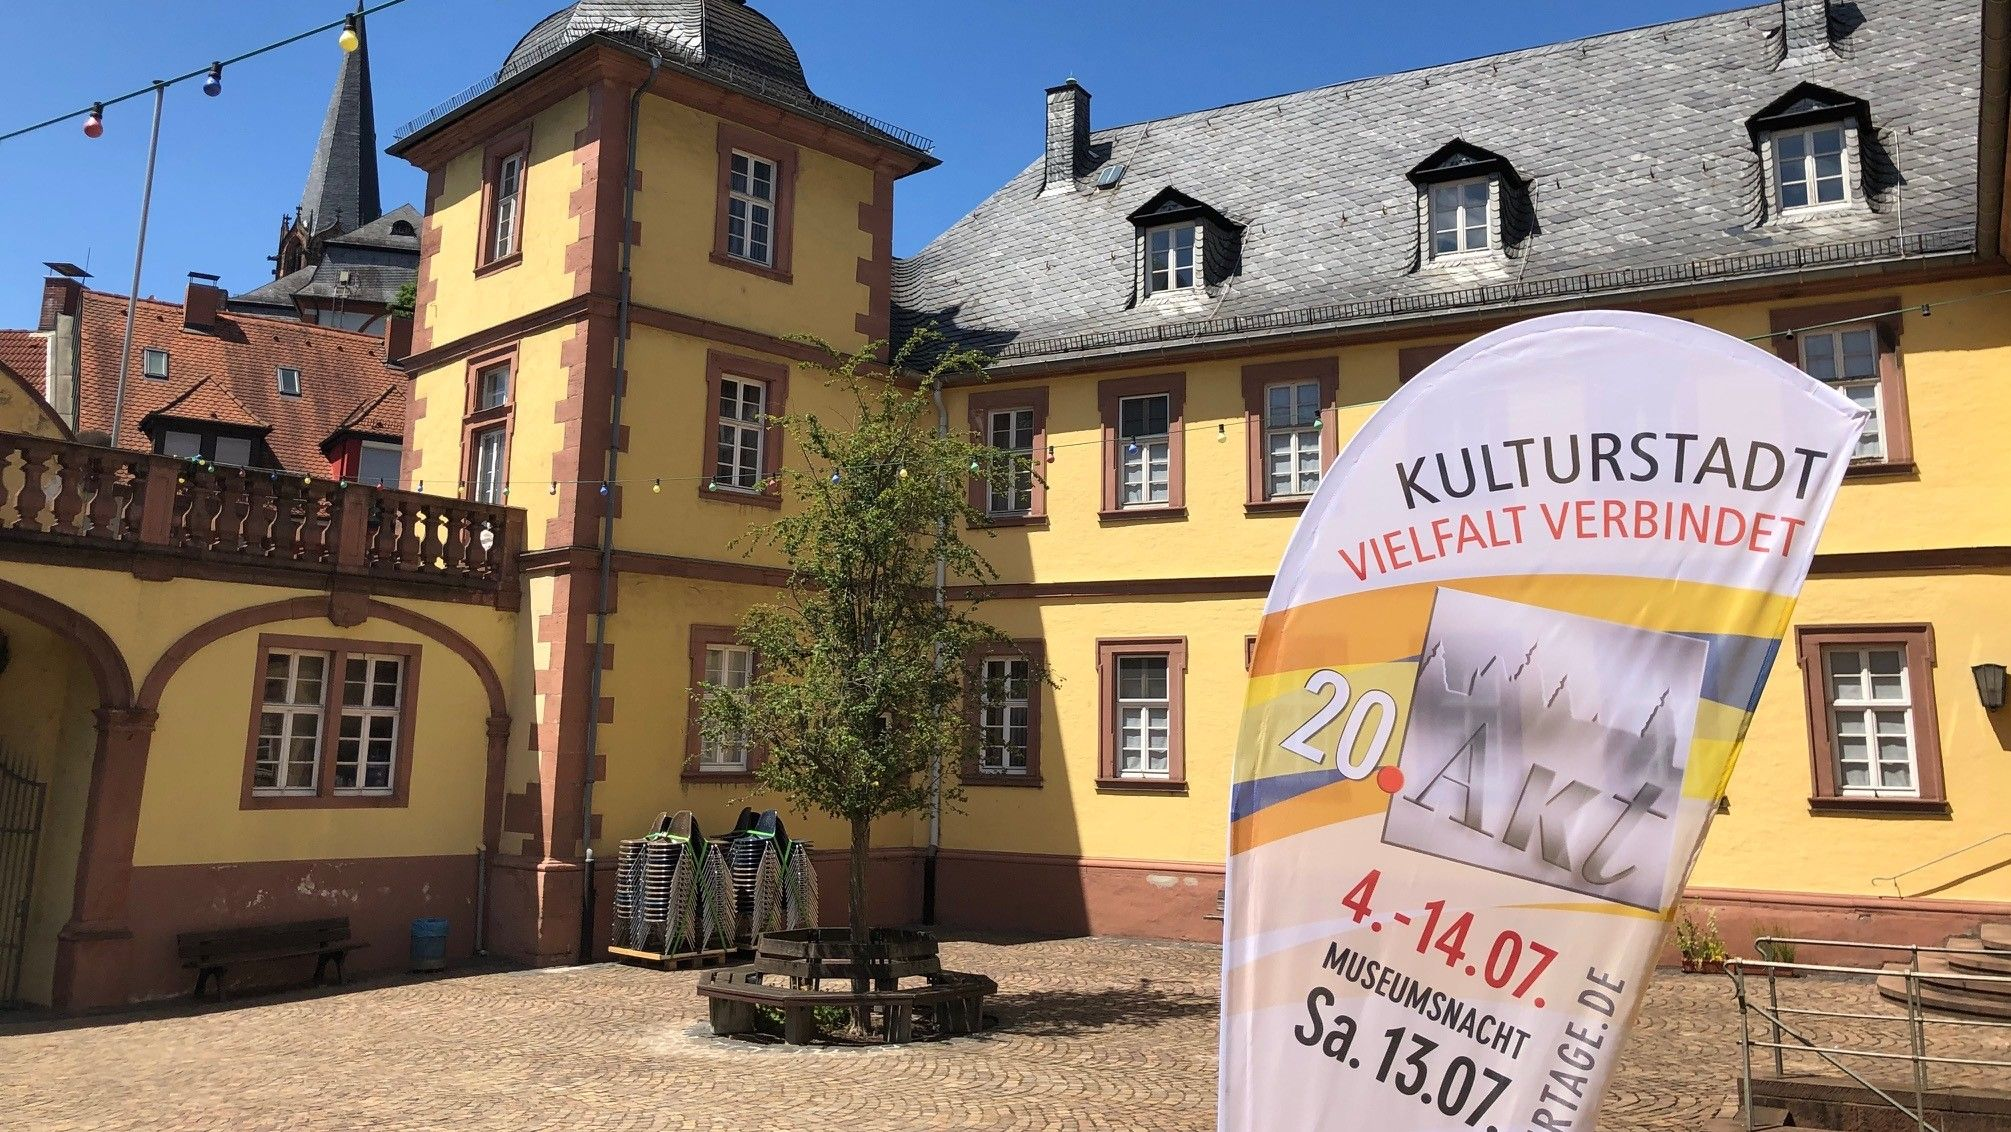 20. Aschaffenburger Kulturtage